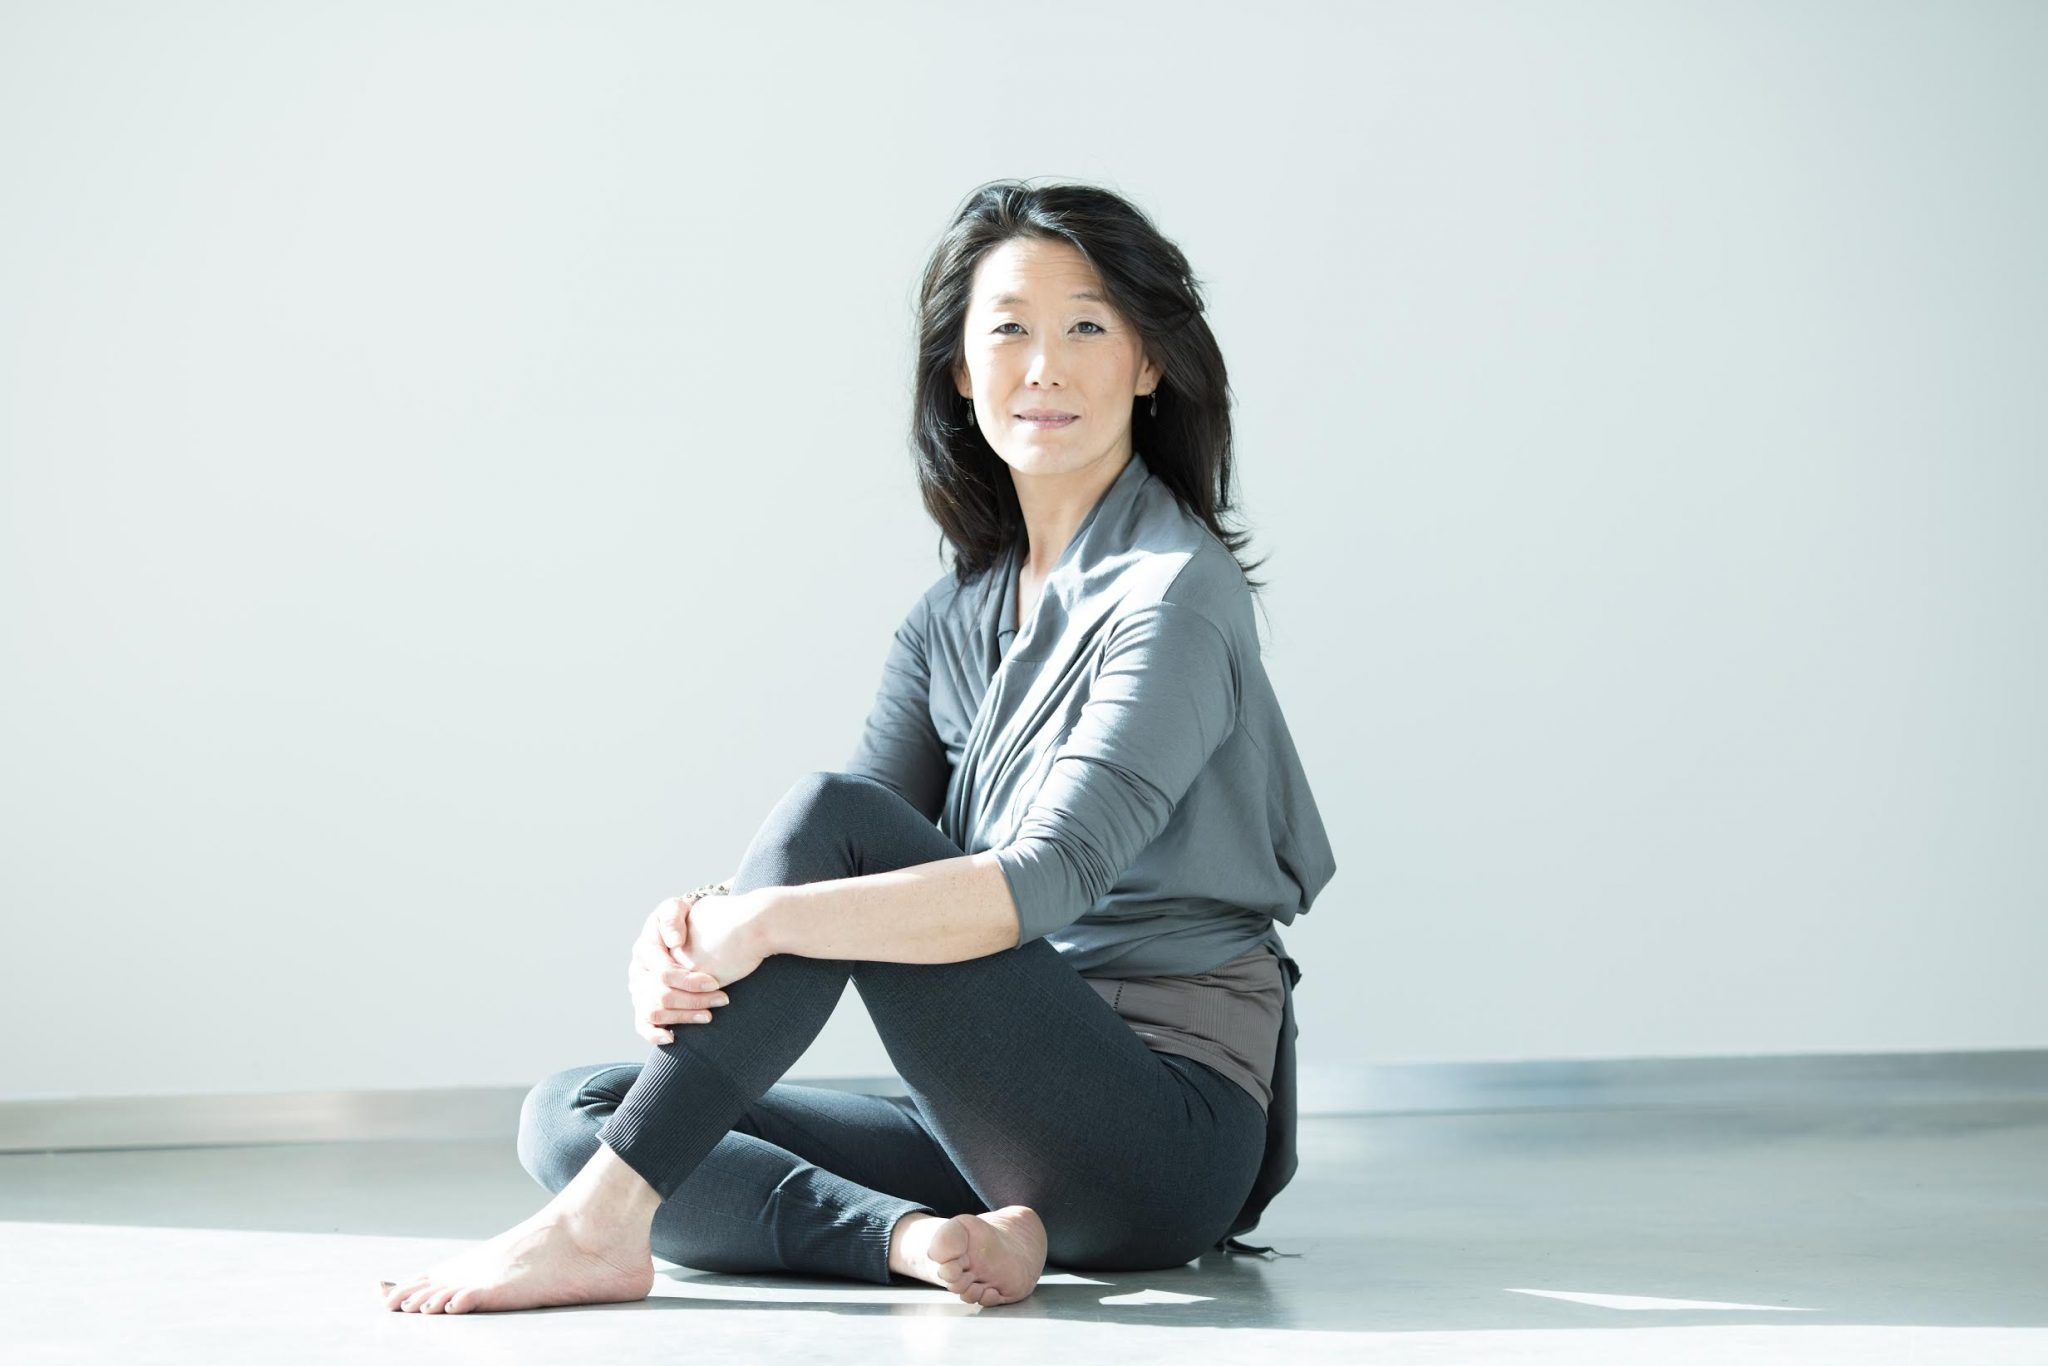 Karianne Kraaijestein yogafest